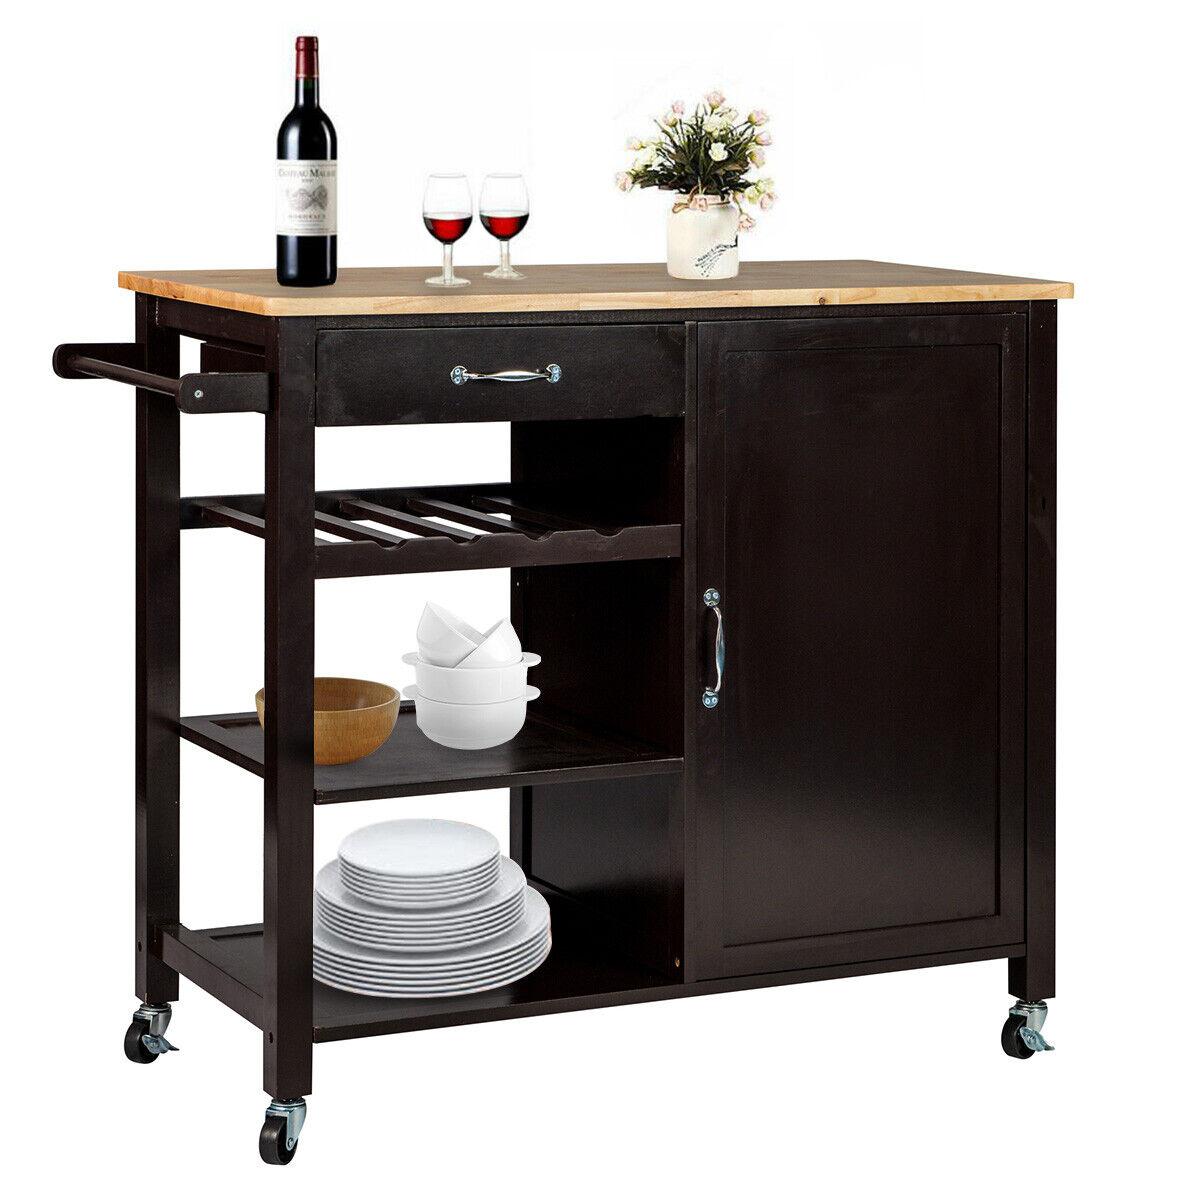 Wooden Kitchen Island Trolley Cart Utility Dining Storage Ca